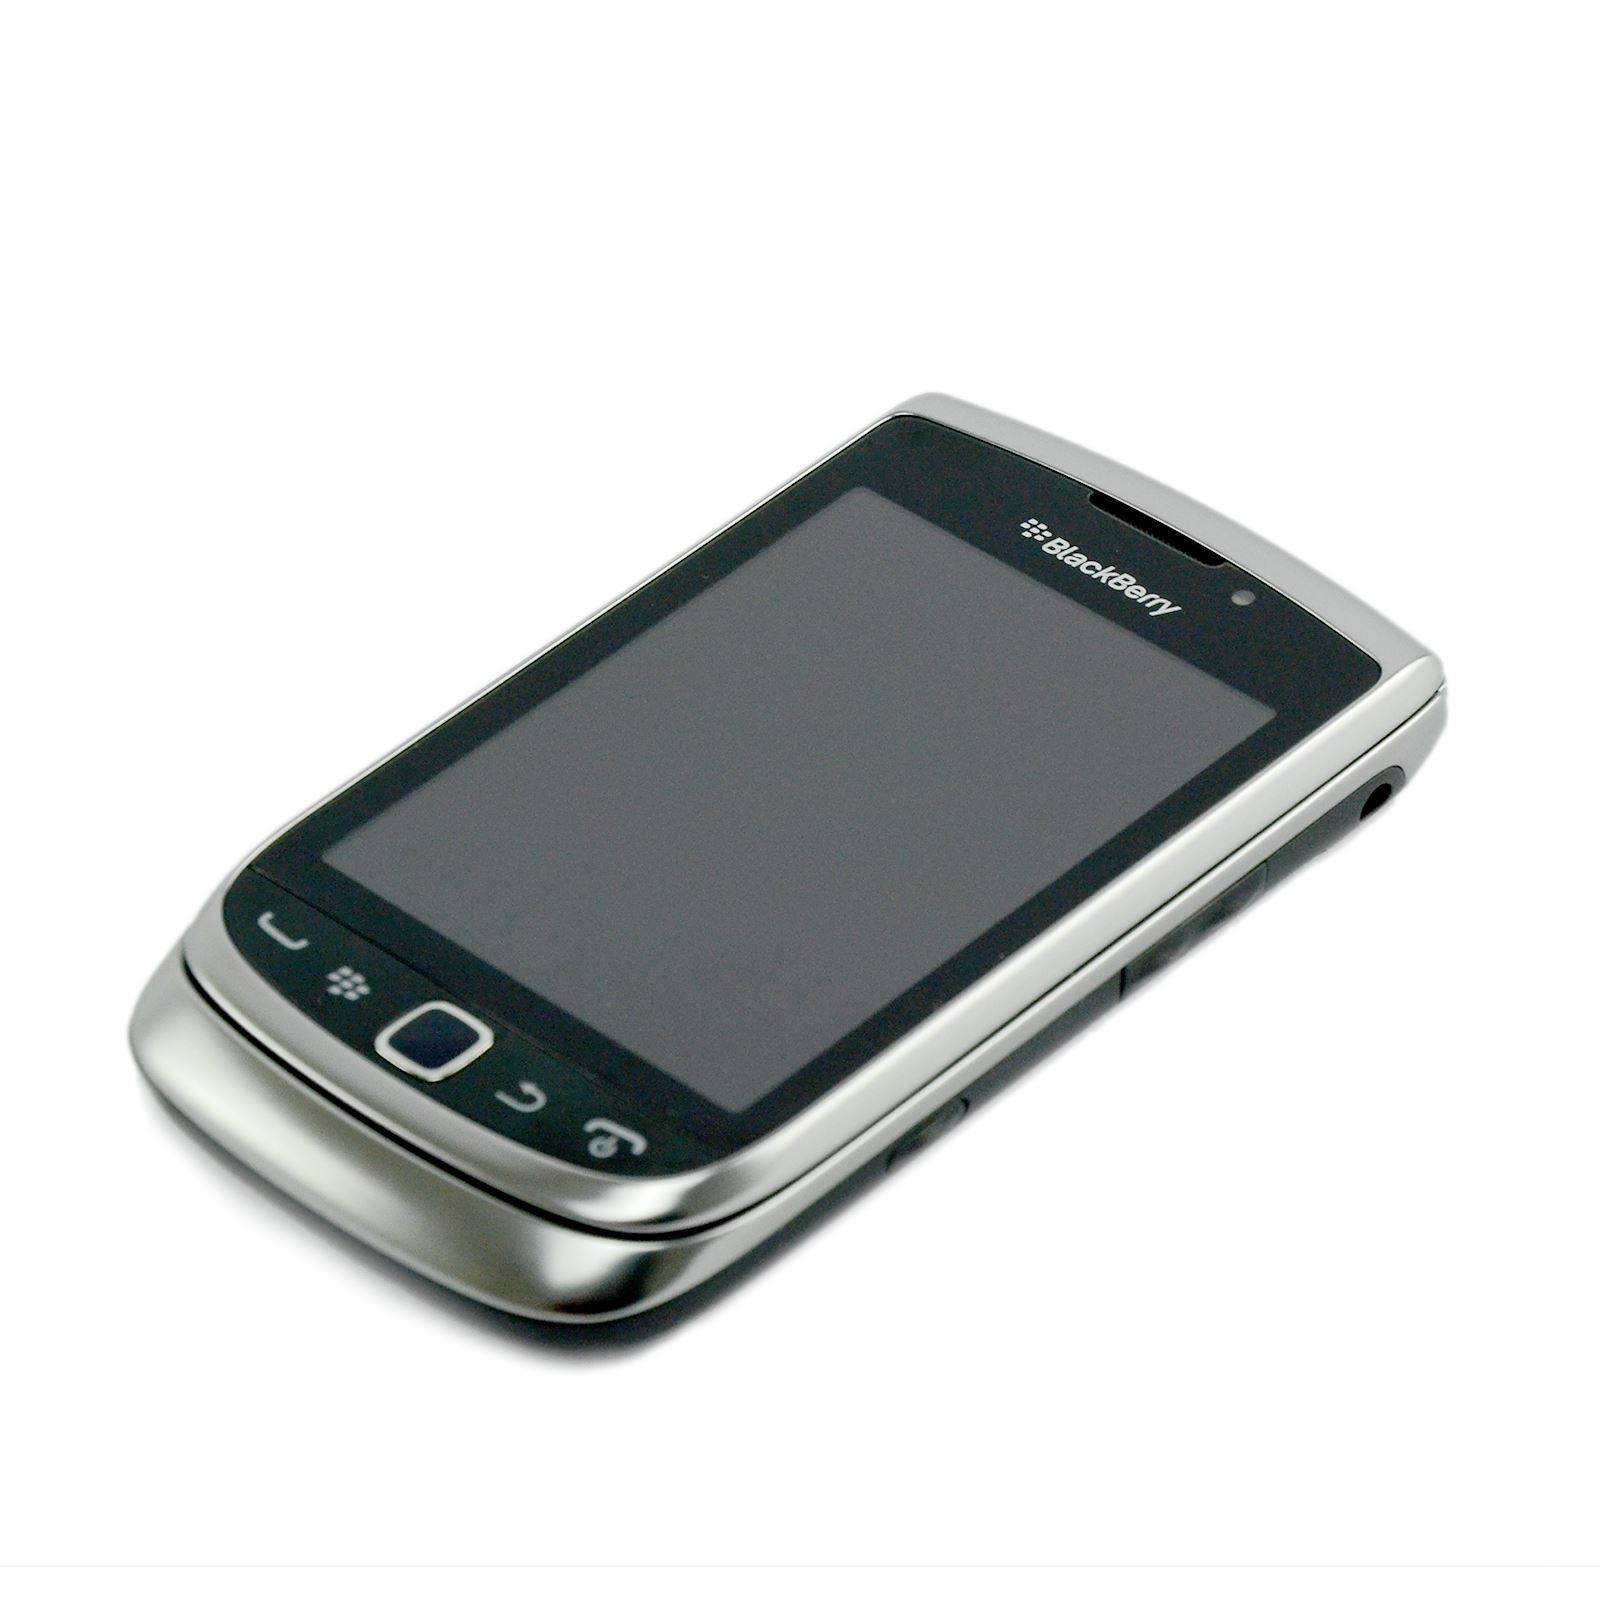 BlackBerry-Torch-9810-Debloque-3-G-3-2-034-8-Go-Tactile-Qwerty-Slider-Smartphone